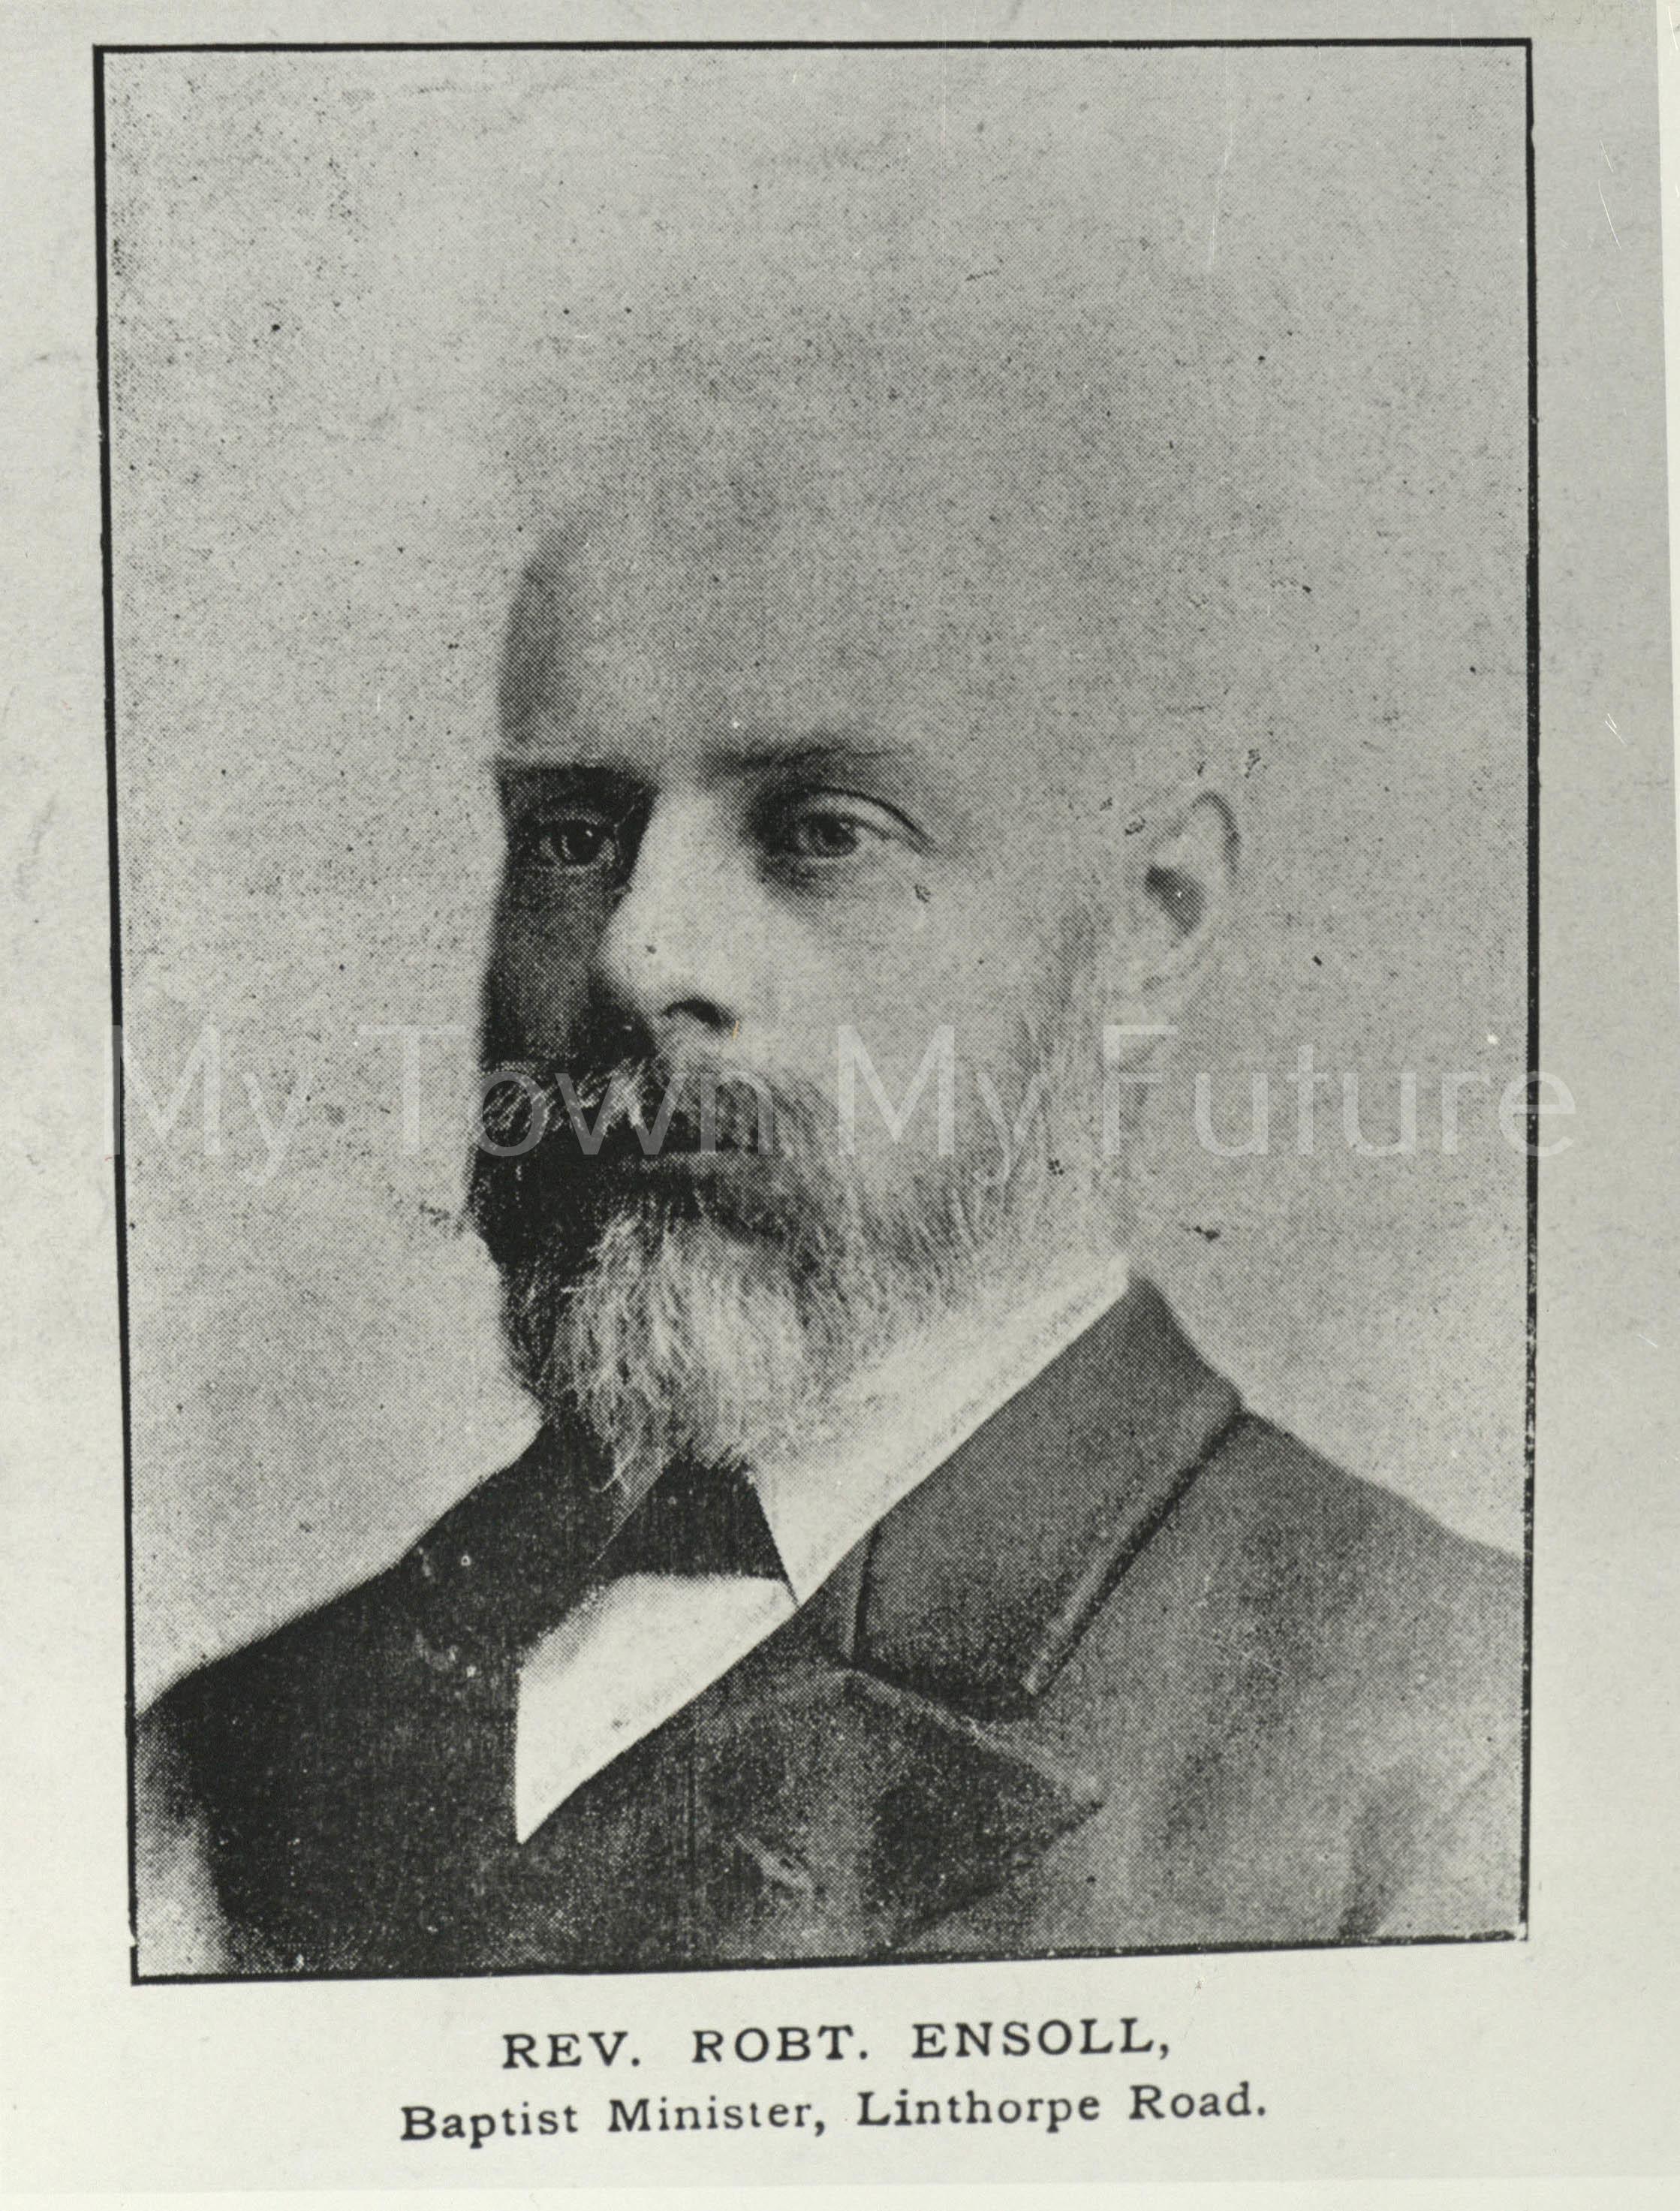 Rev Robert Ensoll Baptist Minister Linthorpe Road 1900